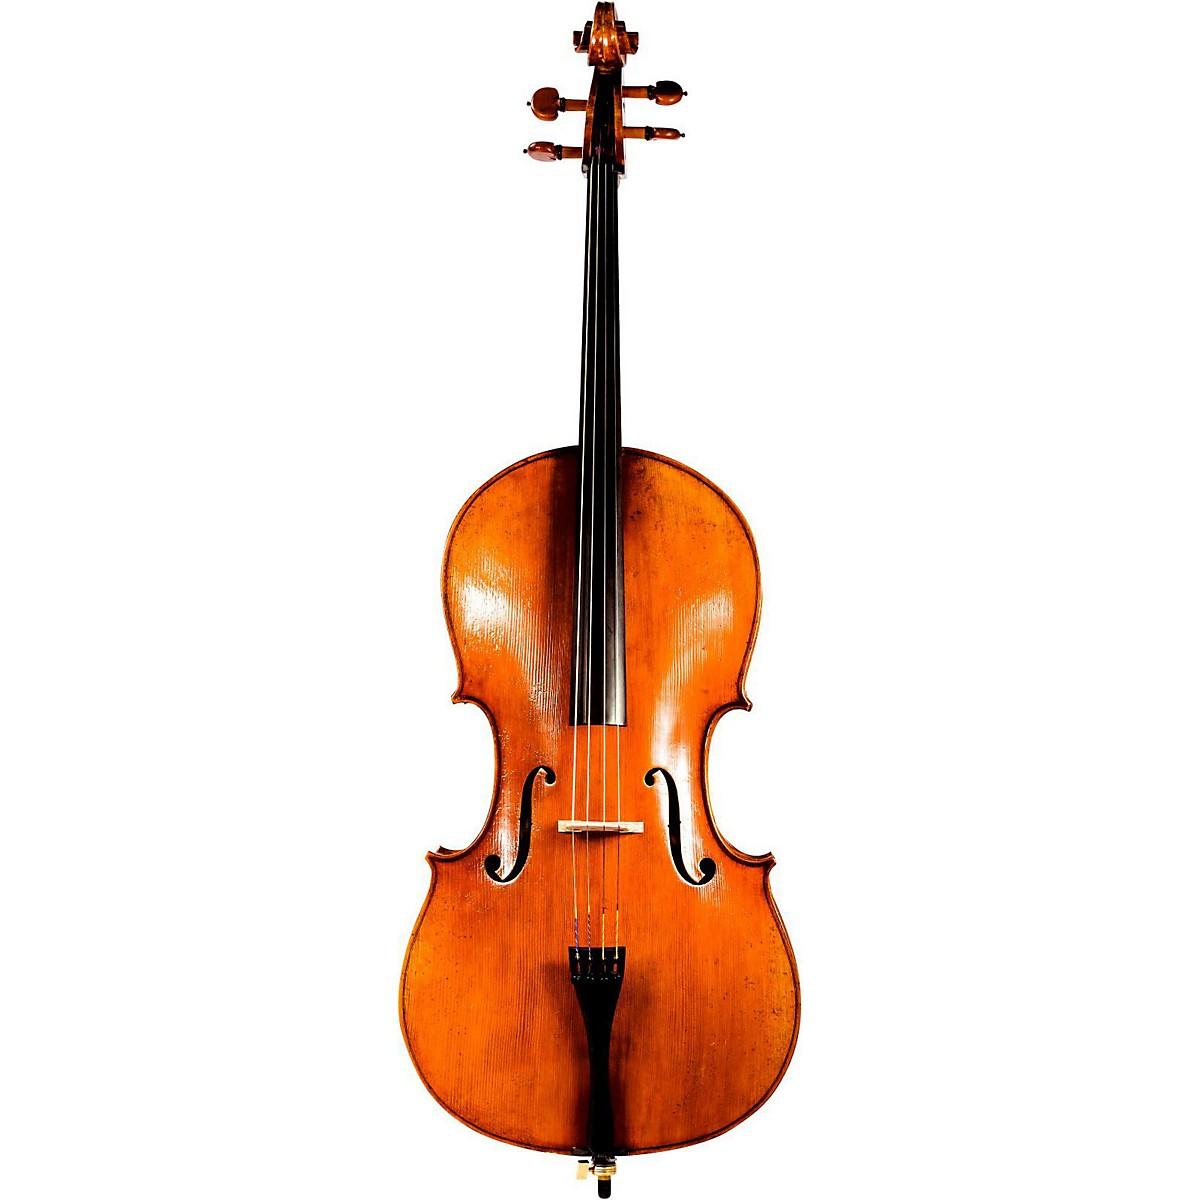 STROBEL MC-500 Recital Series Cello Outfit